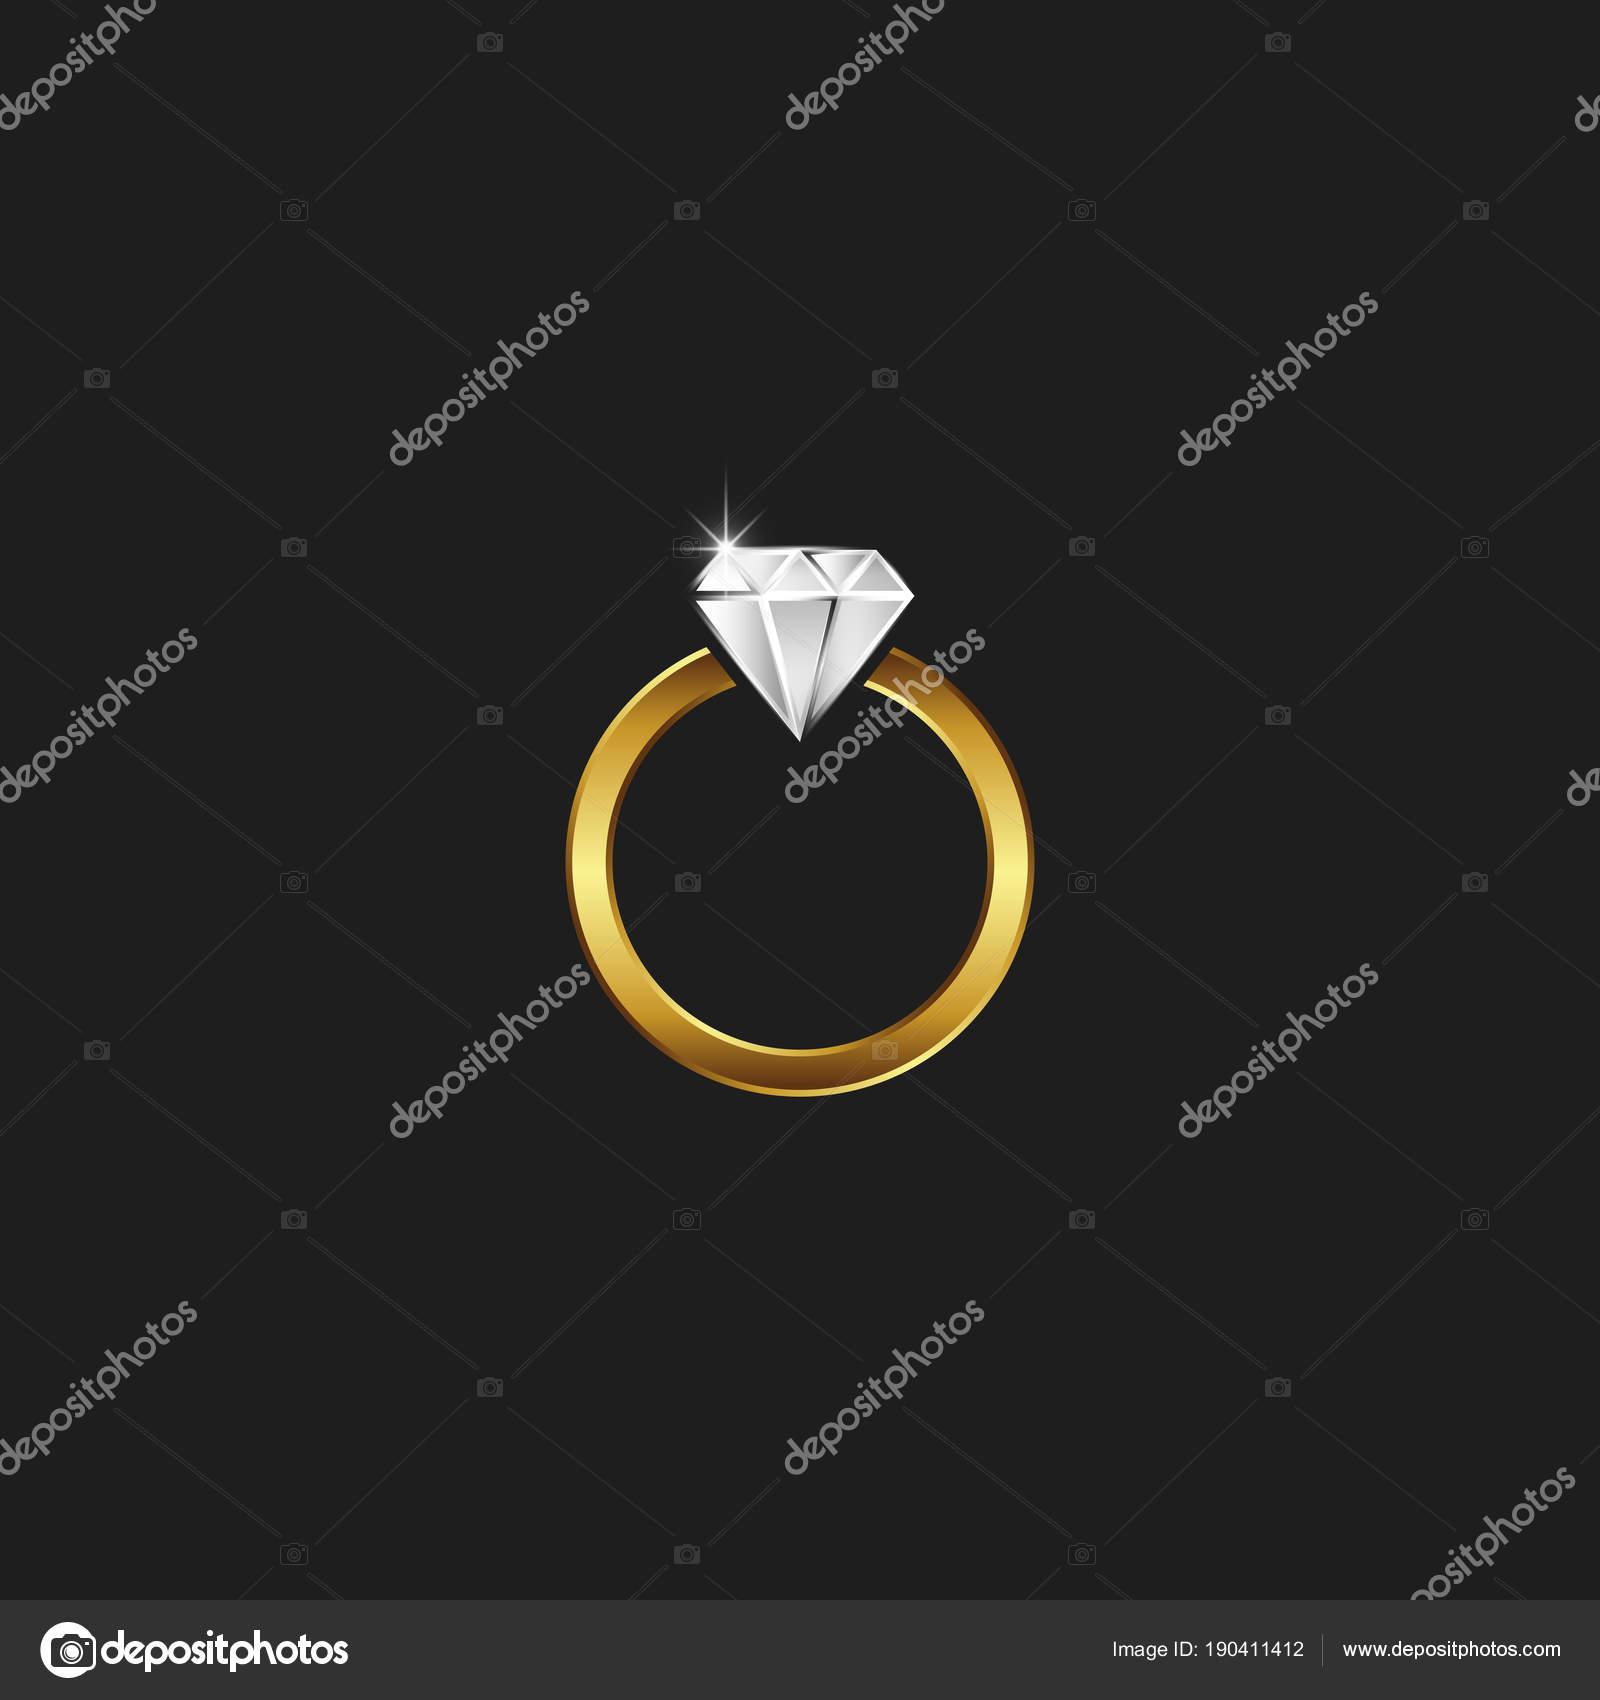 2019 year style- Ring diamond logo